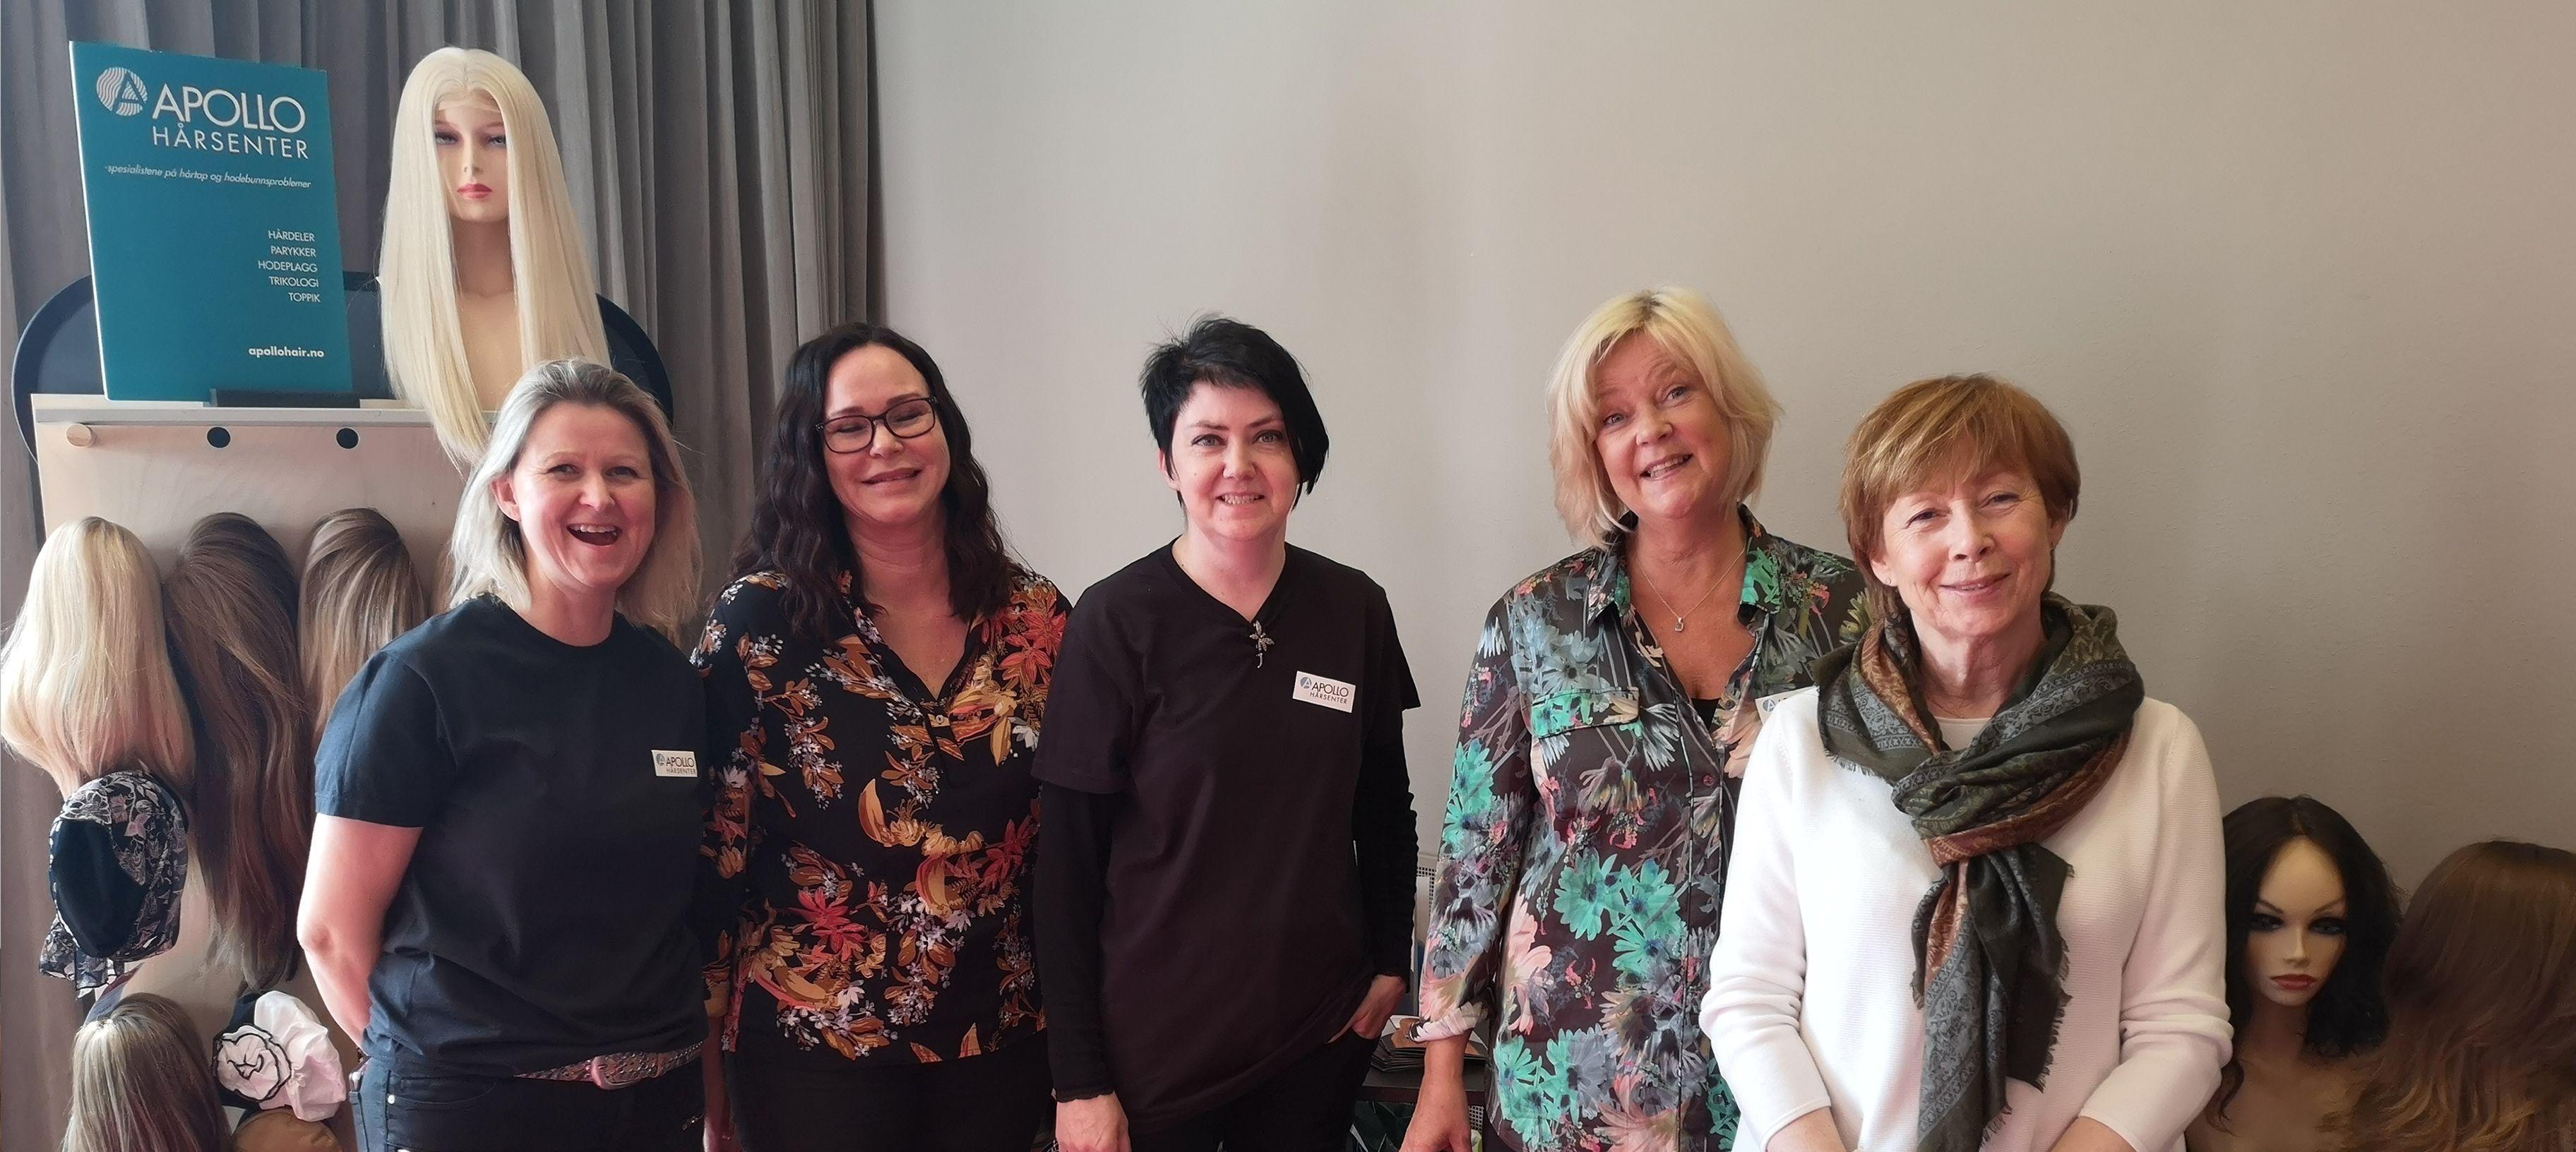 Alopeciadagen 2019 gruppebildet stand